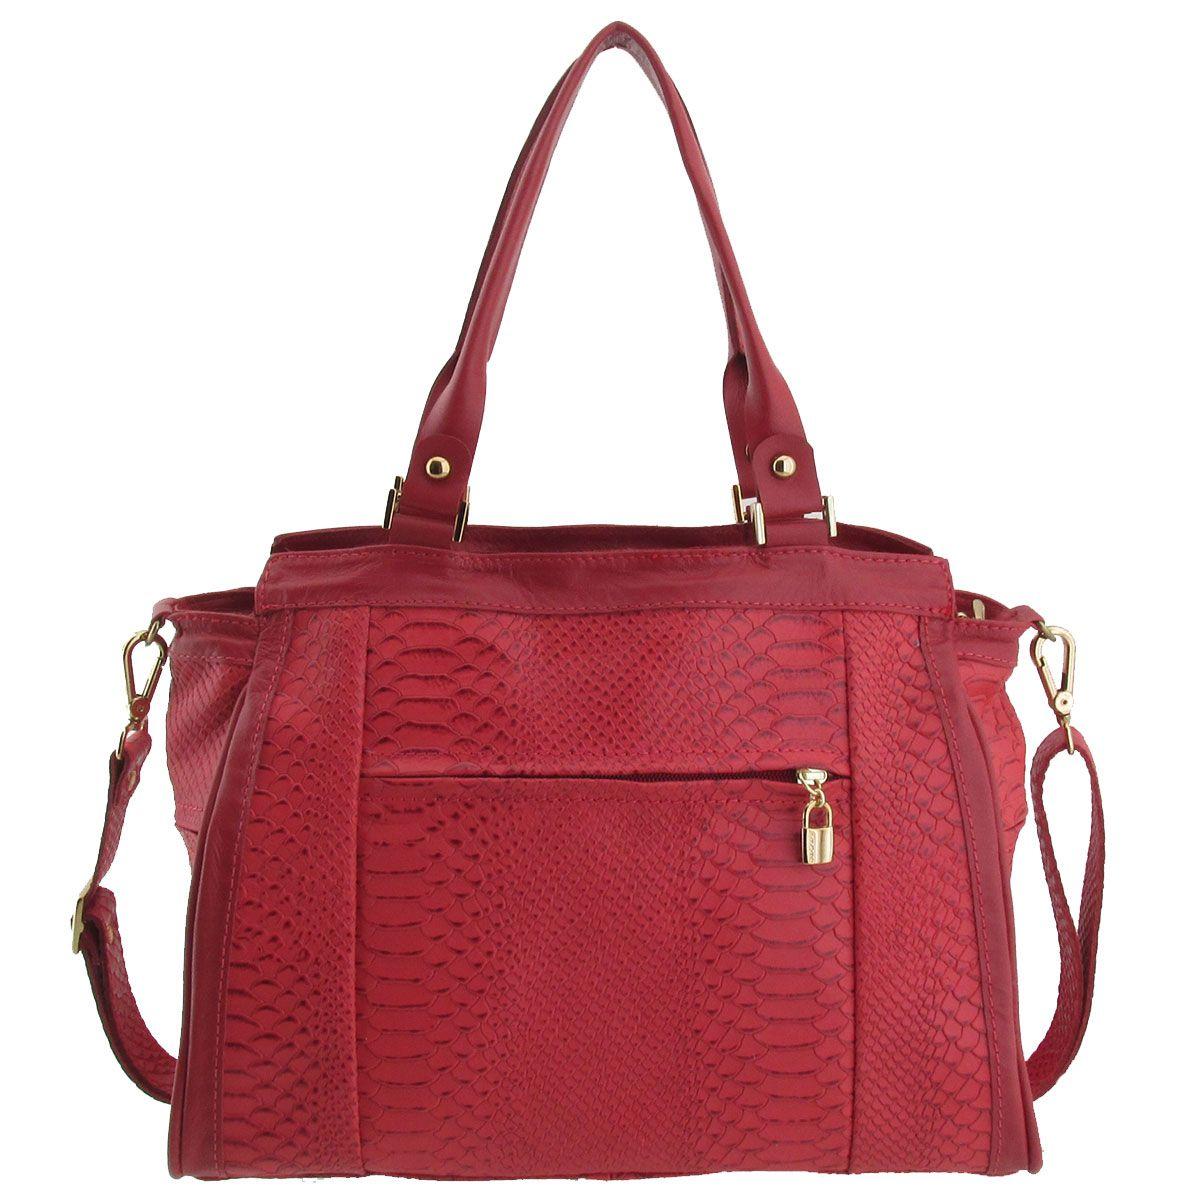 Bolsa Feminina Vermelha : Arzon bolsa feminina vermelha